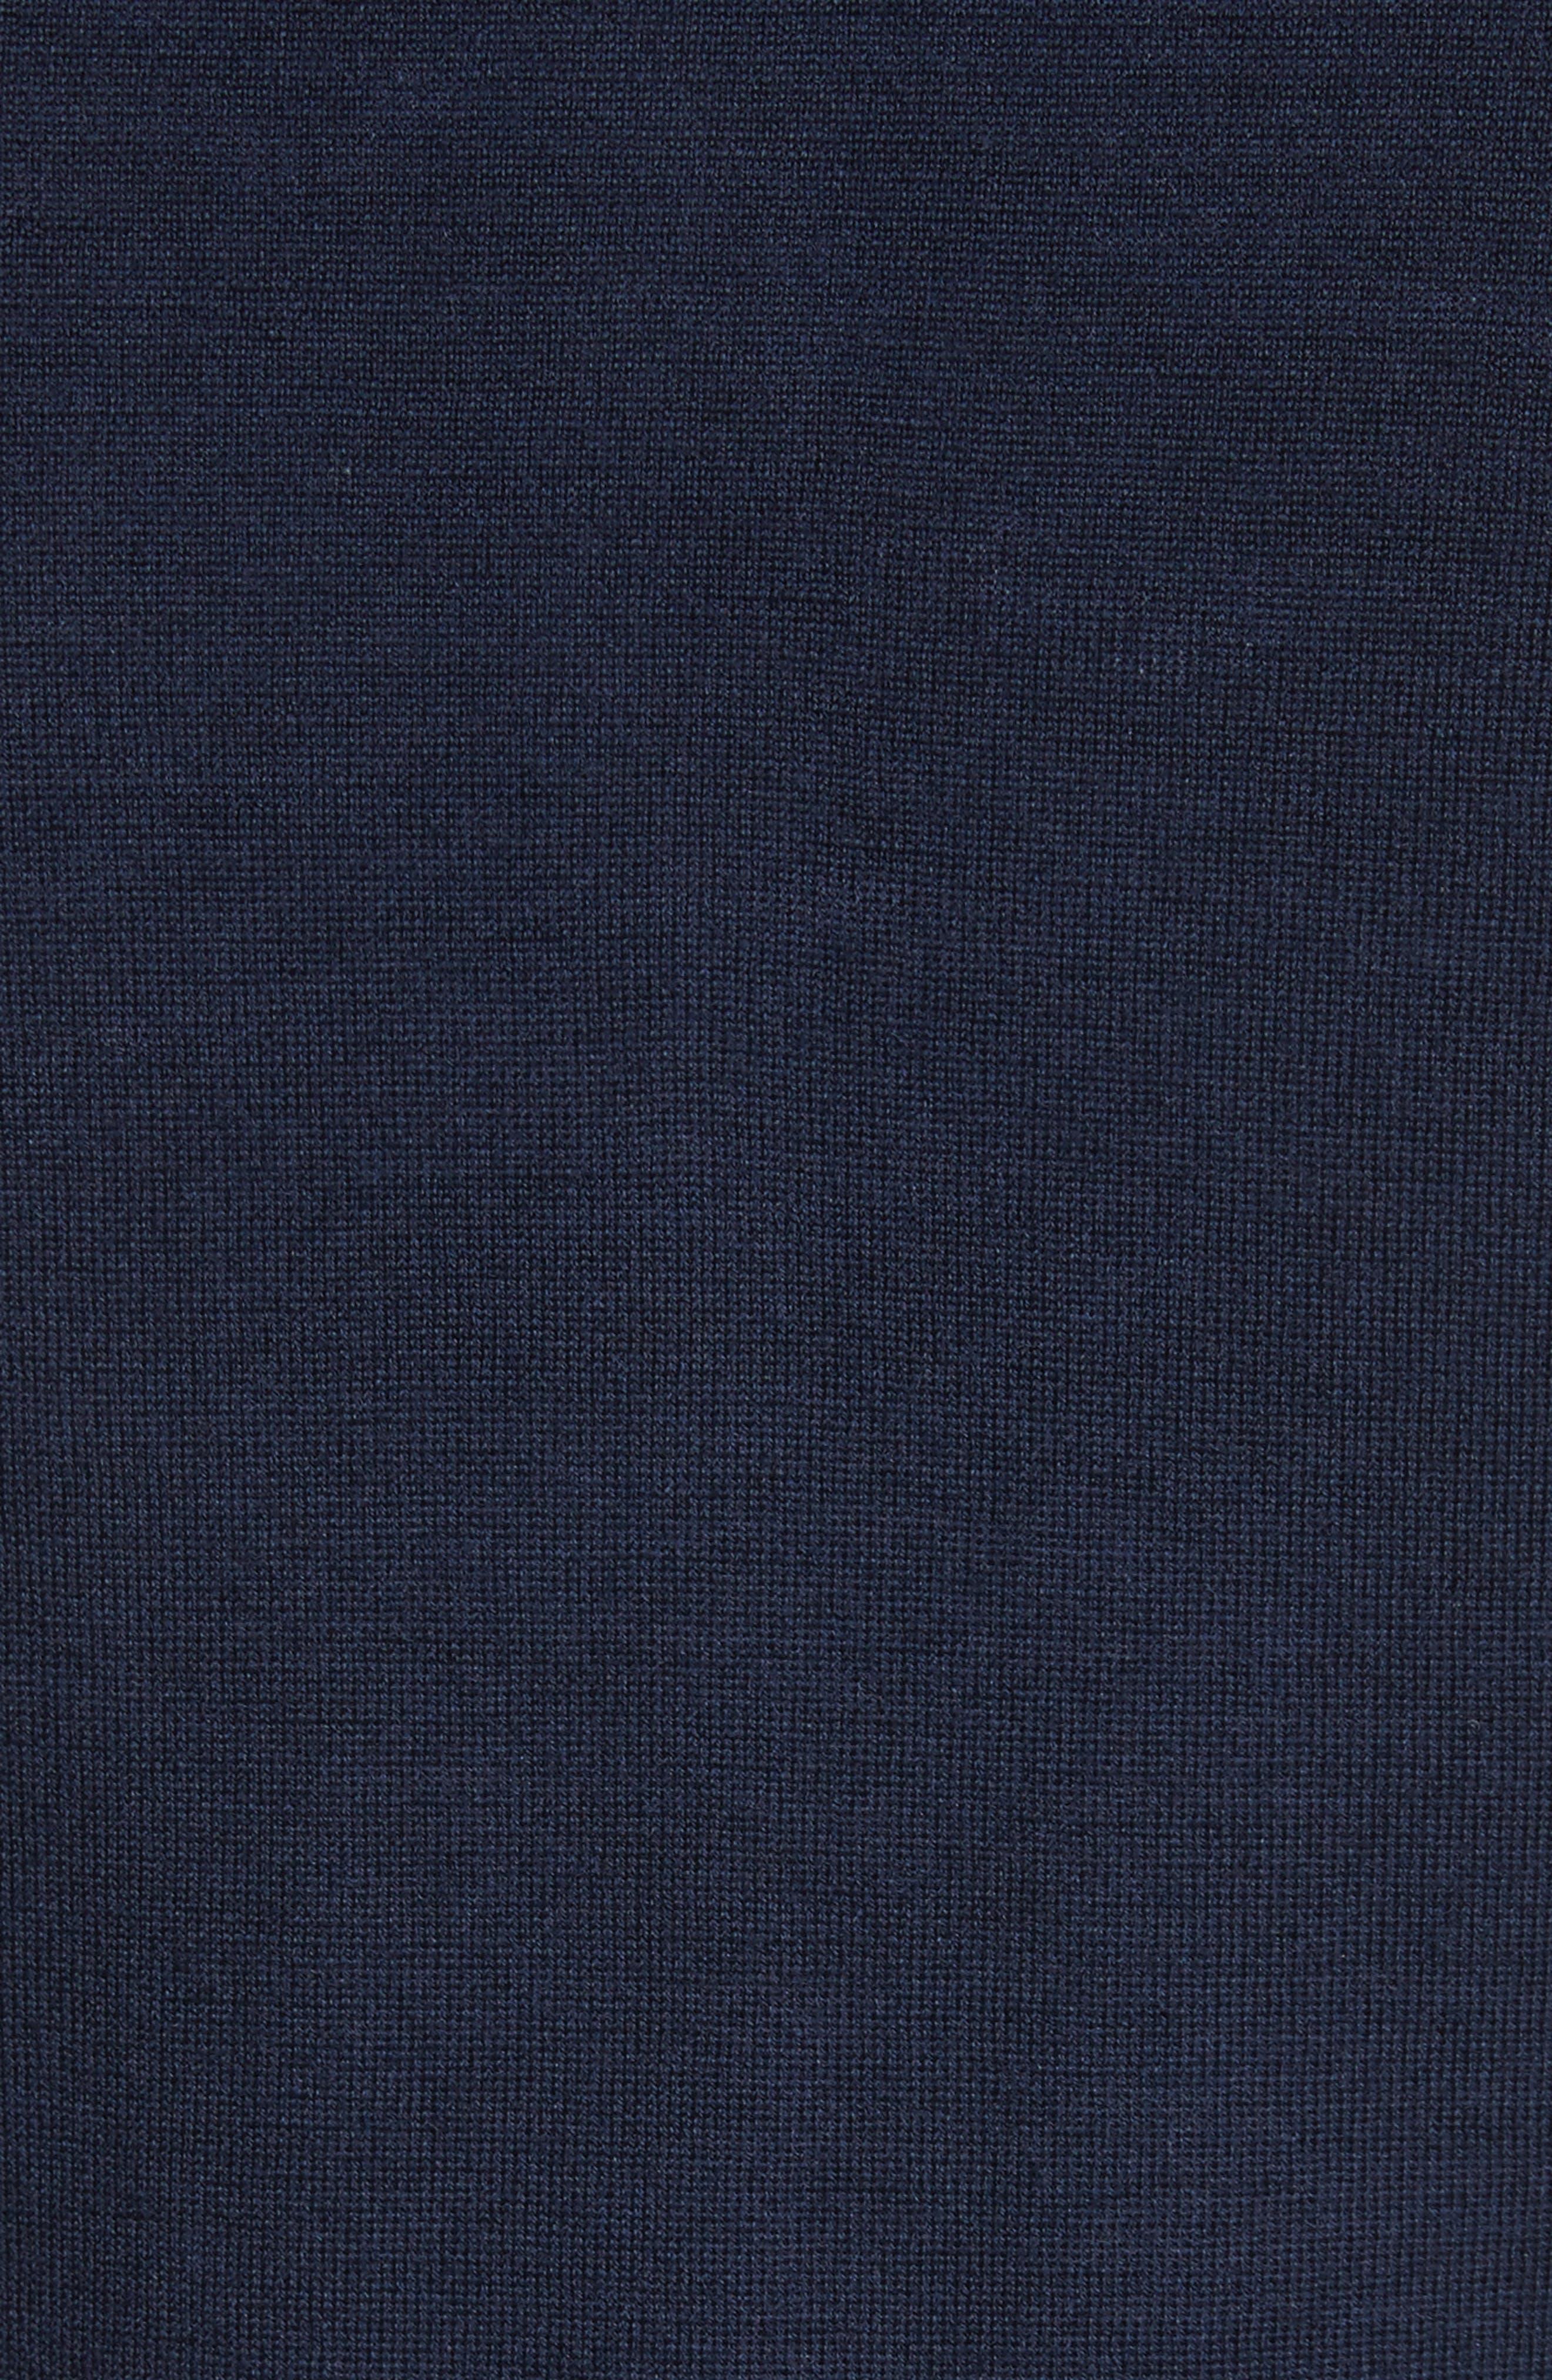 Zip Front Raglan Sweatshirt,                             Alternate thumbnail 5, color,                             414